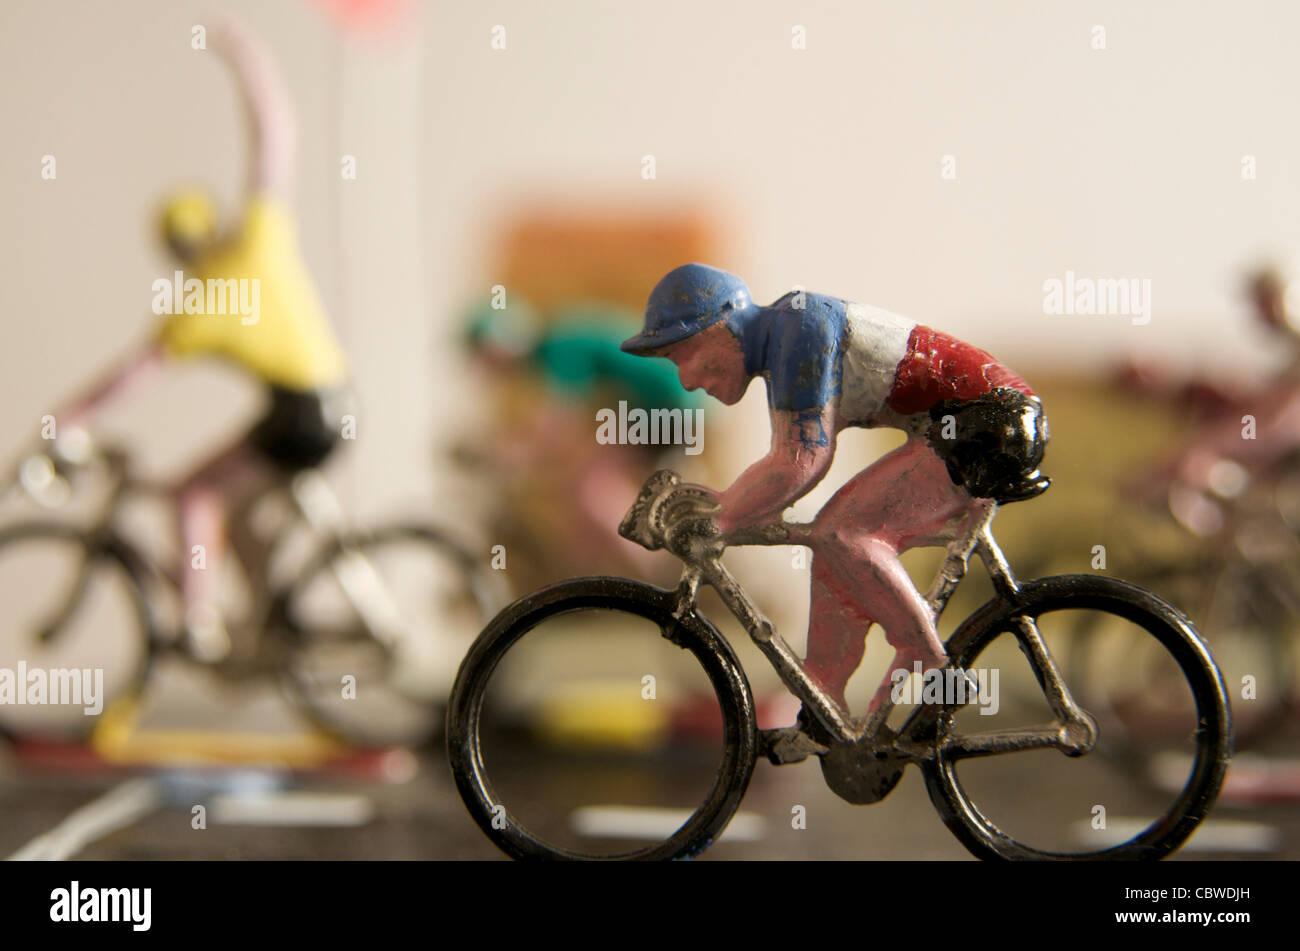 Radfahrer, Figurinen - Gewinner-Konzept Stockbild